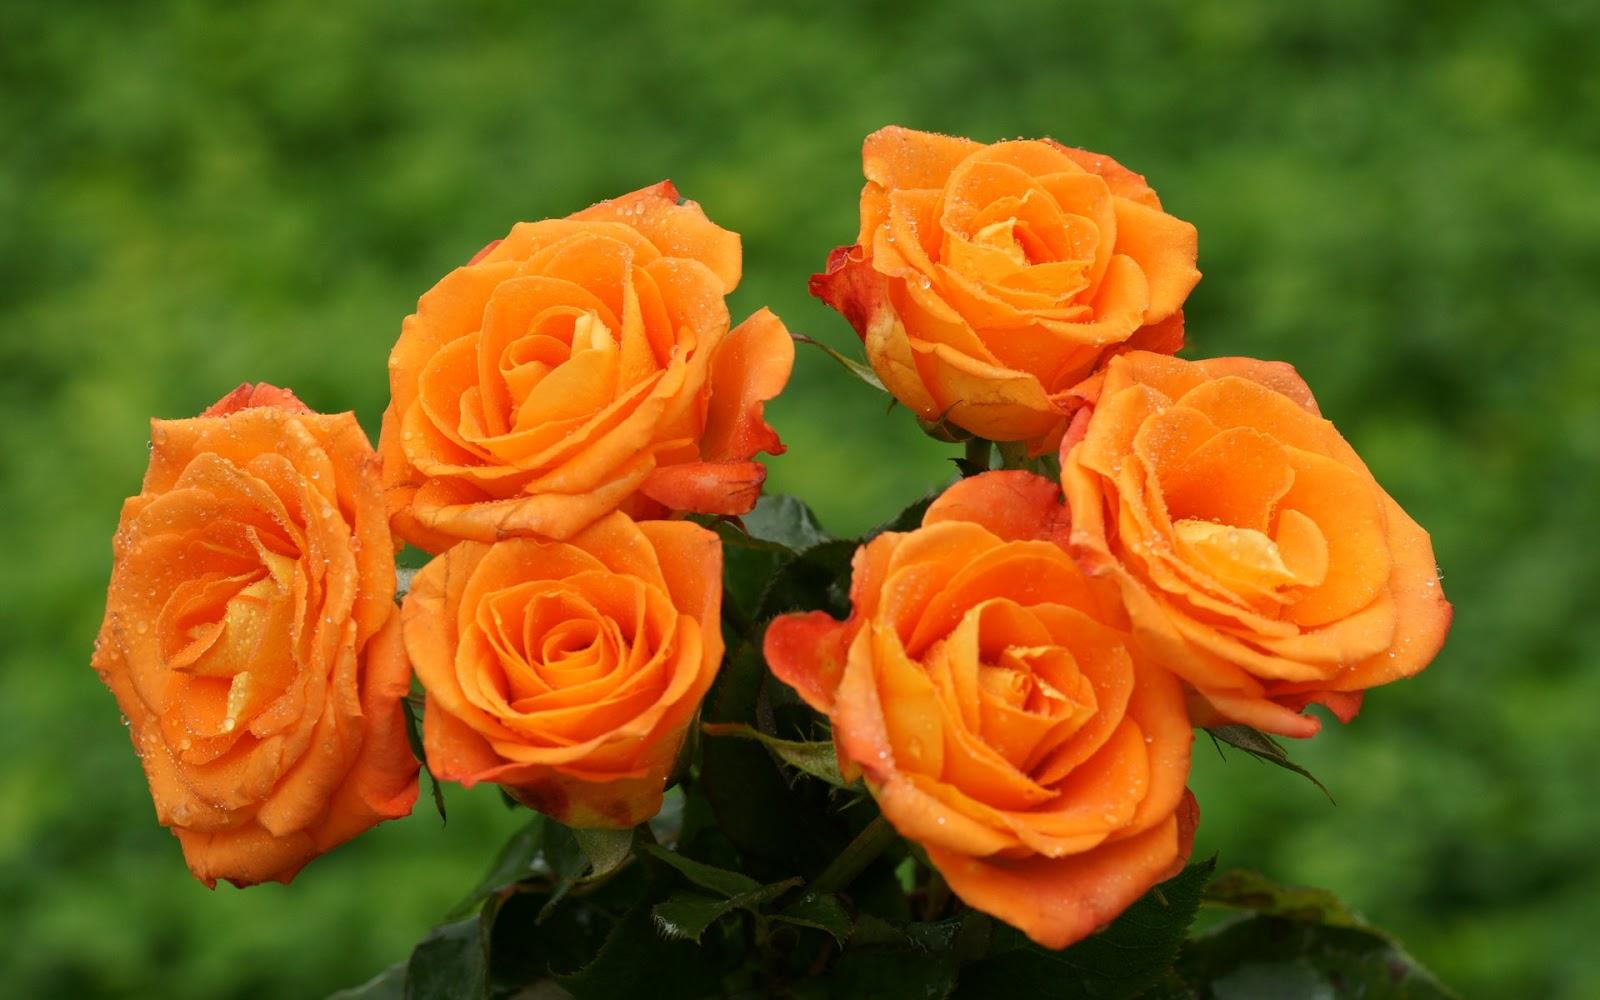 Beautiful Roses HD Desktop Wallpapers in 1080p ~ Super HD Wallpaperss